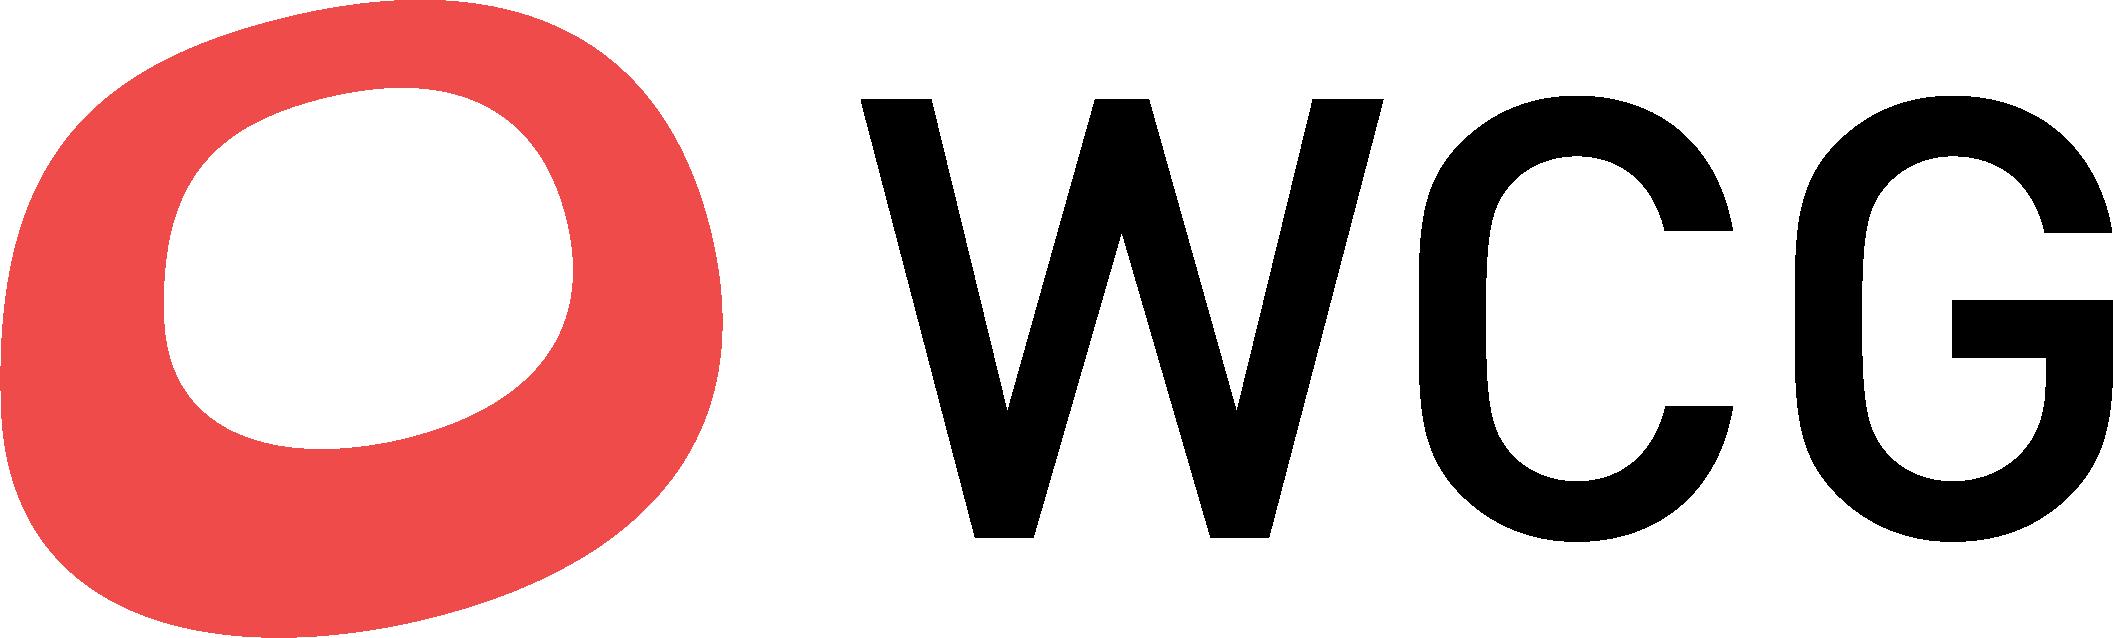 WCG (Warwickshire College Group)'s logo